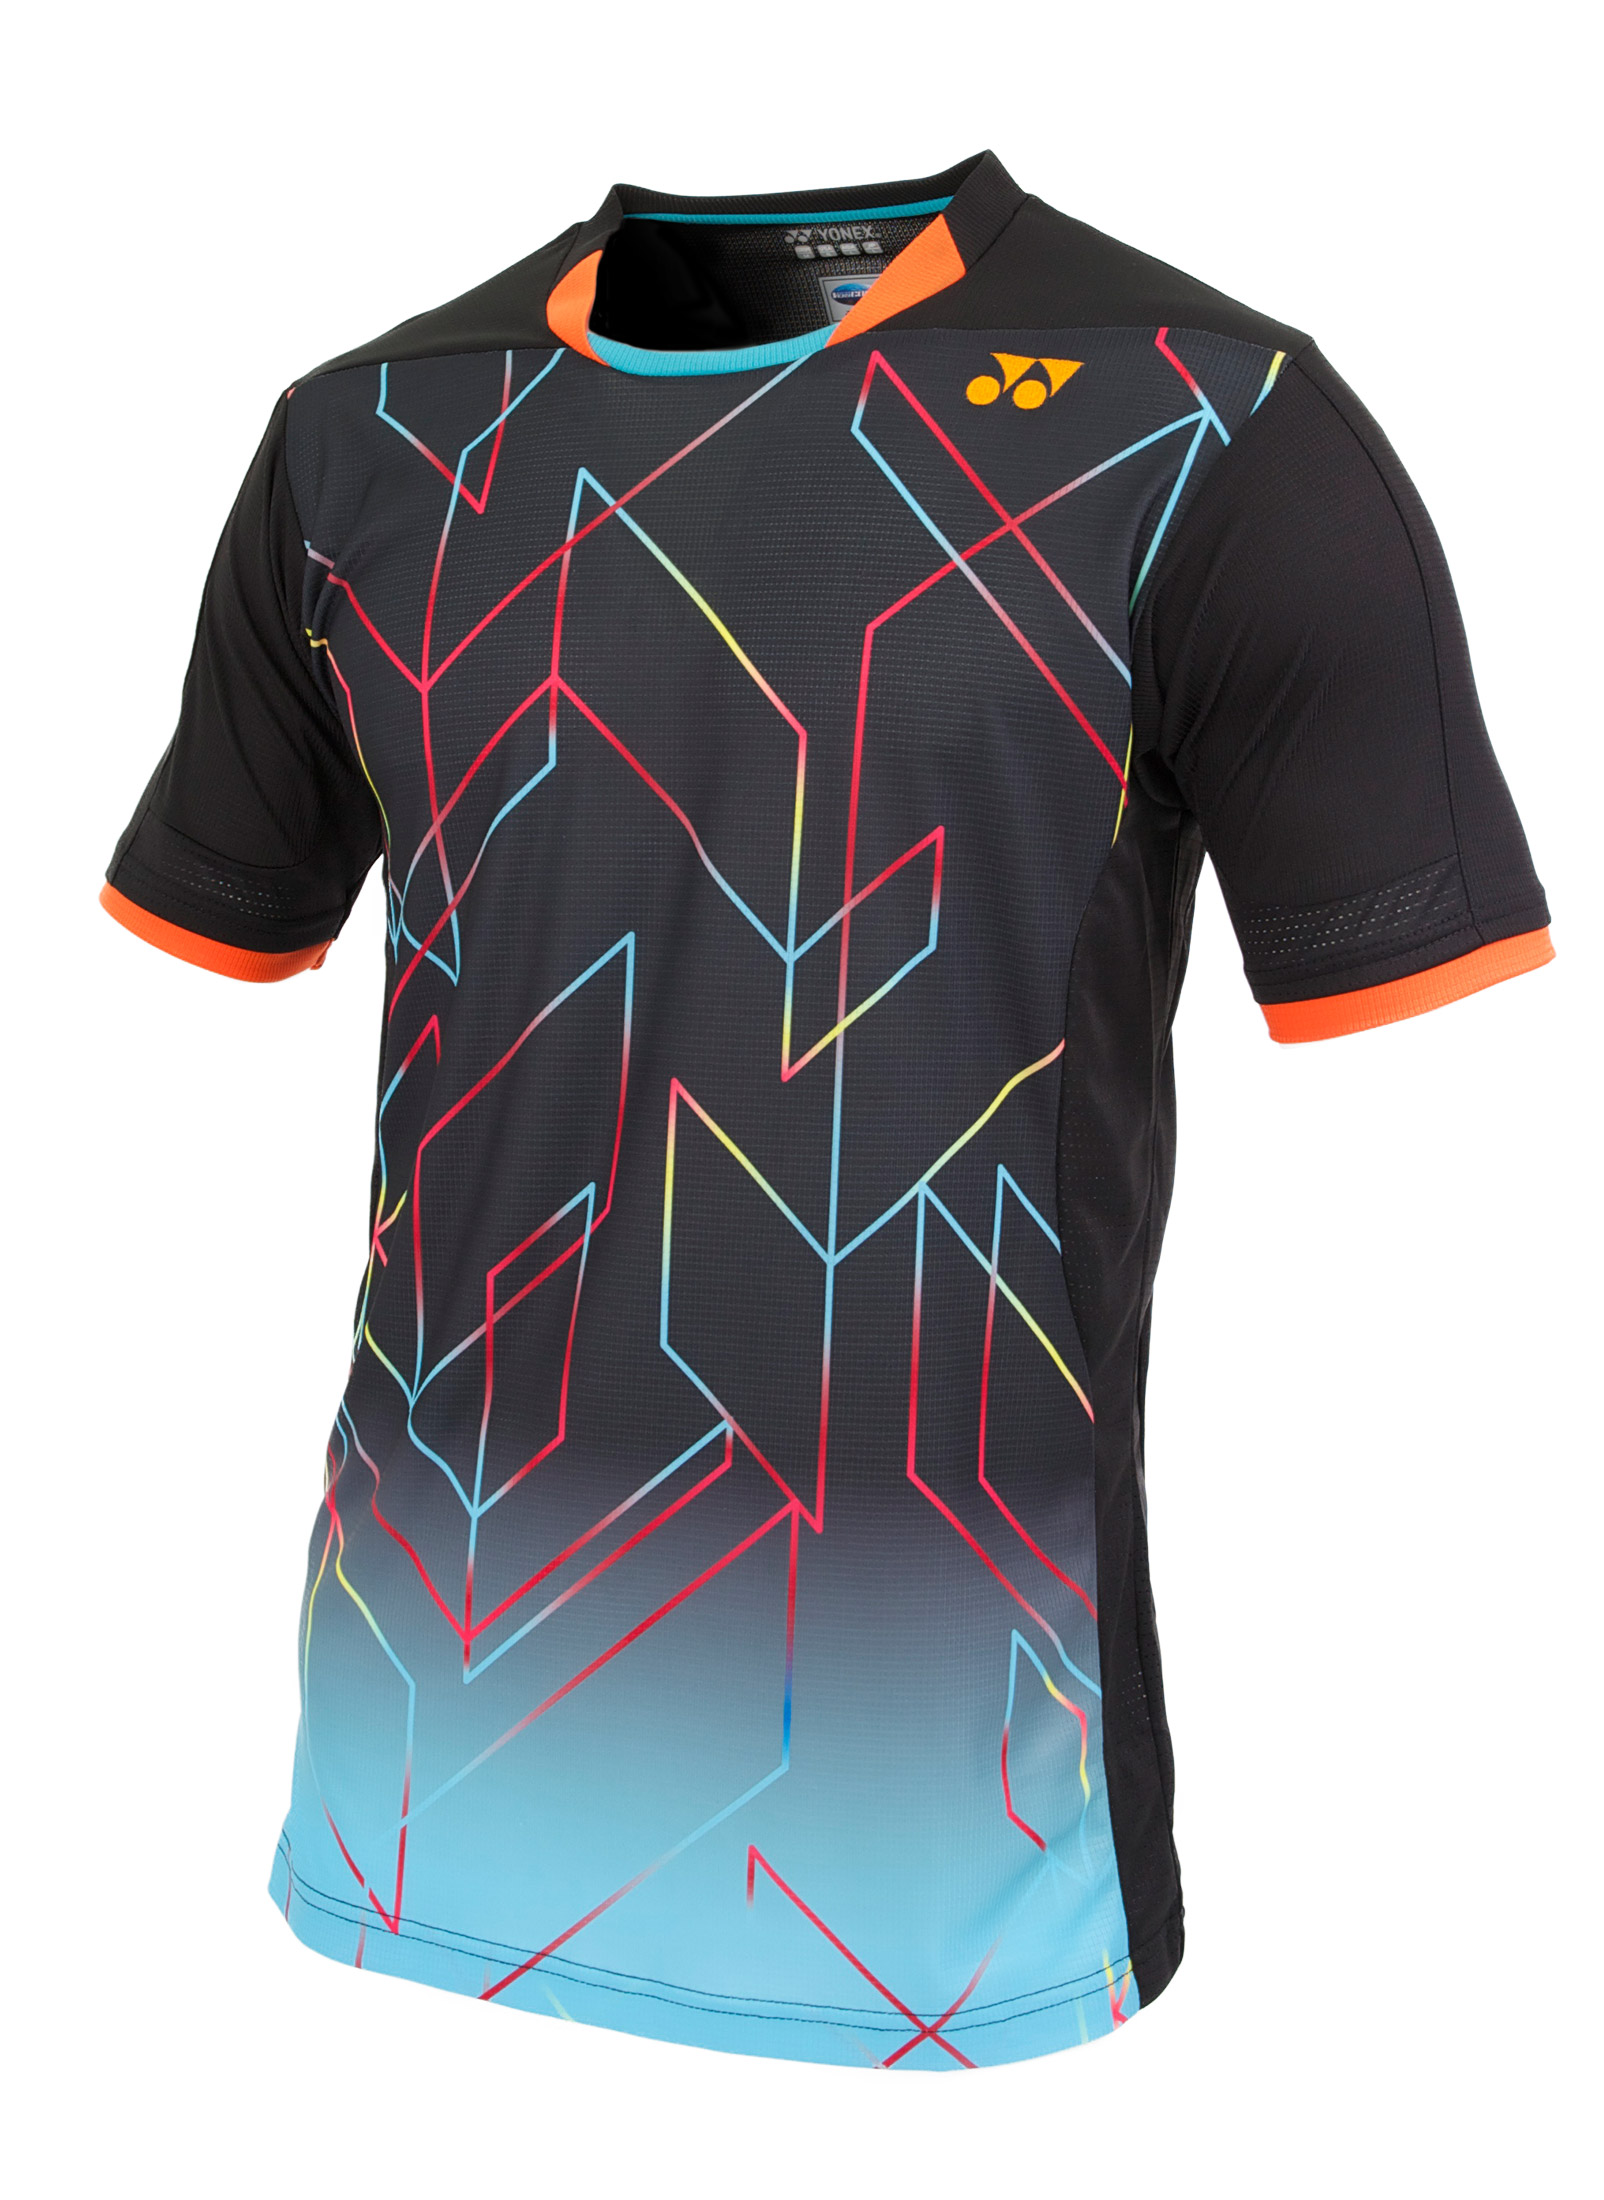 Desain t shirt elegan - 2e17be7950